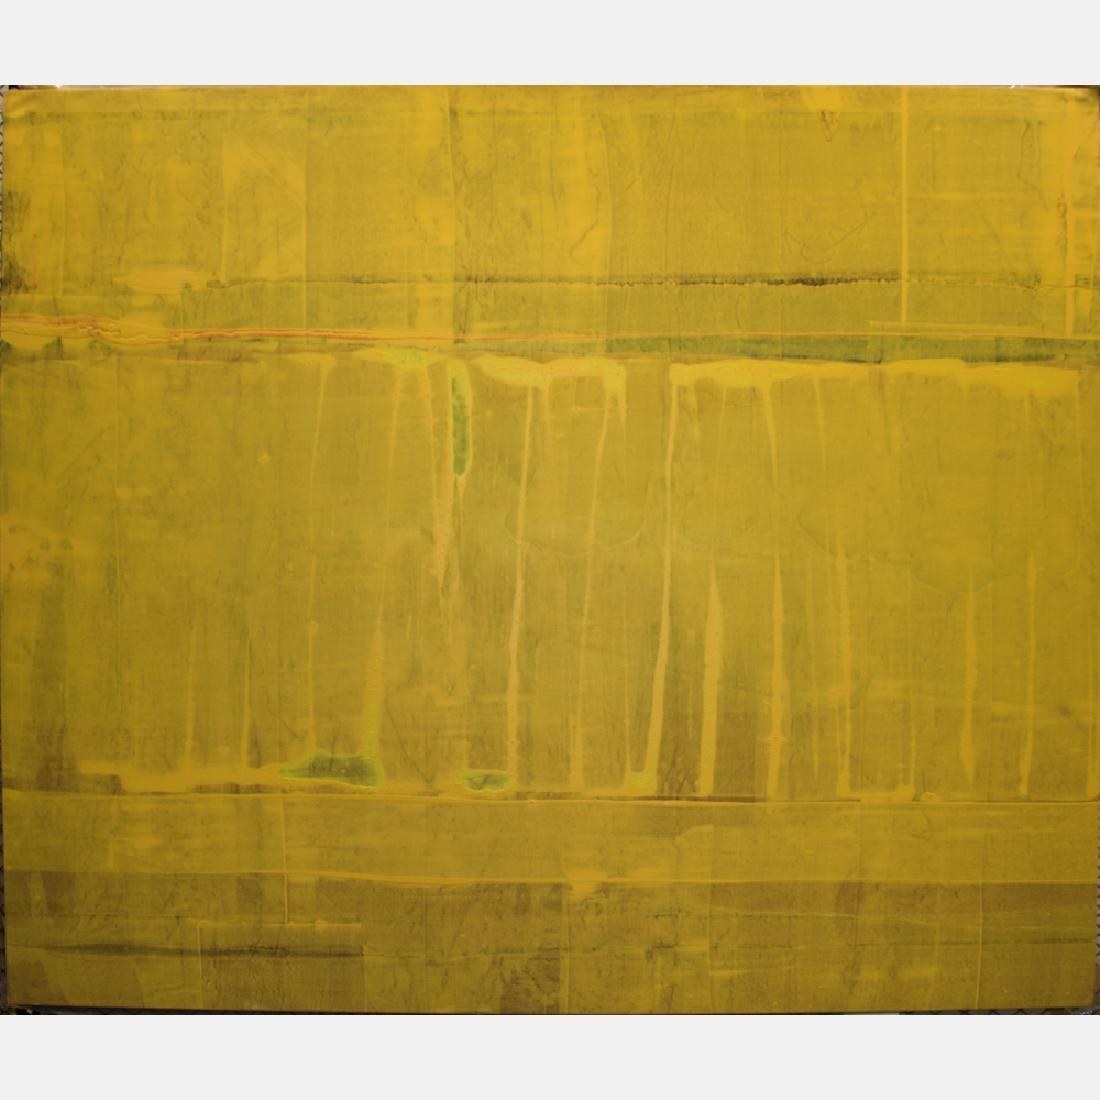 William Pettet (b. 1942) Duke, Acrylic on canvas. - 2